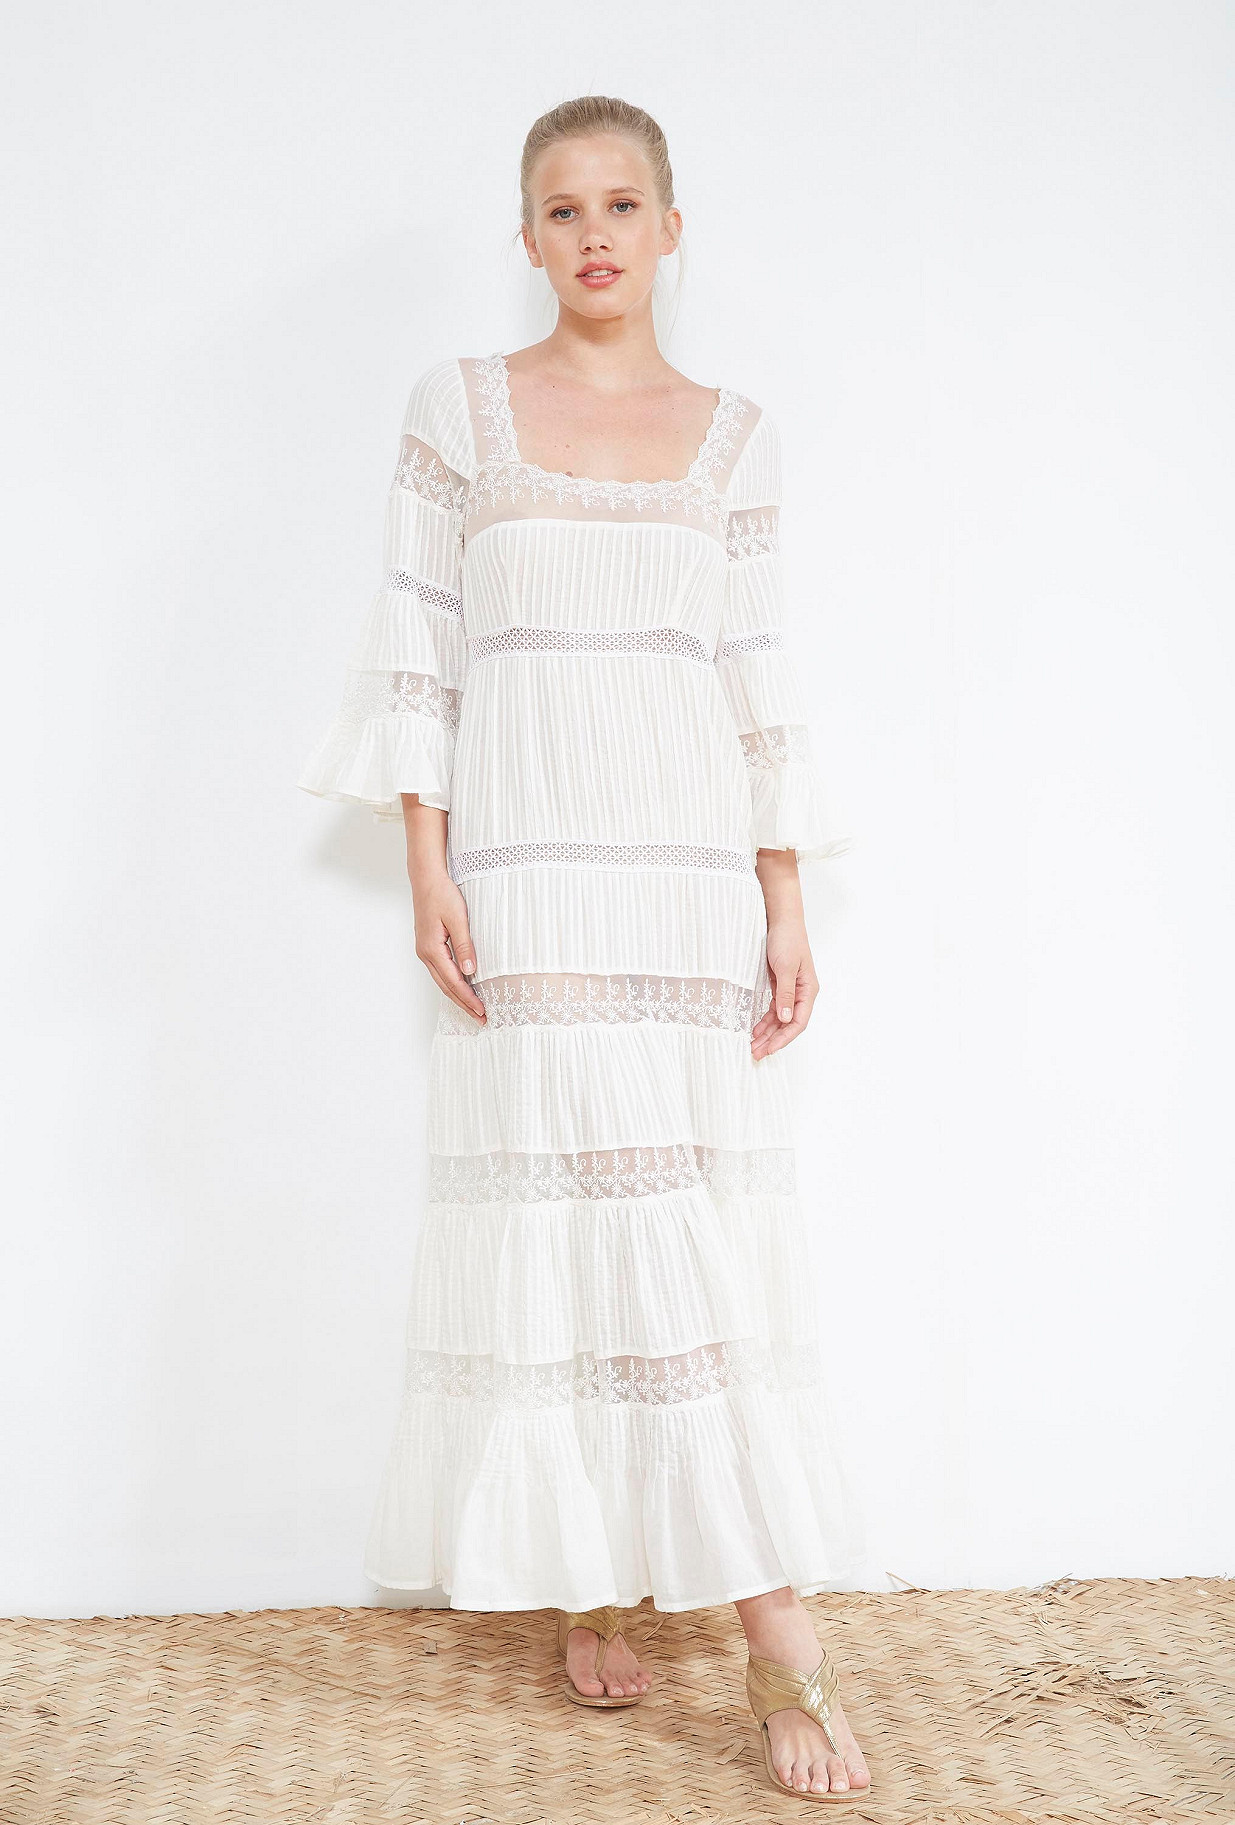 clothes store DRESS  Havilland french designer fashion Paris